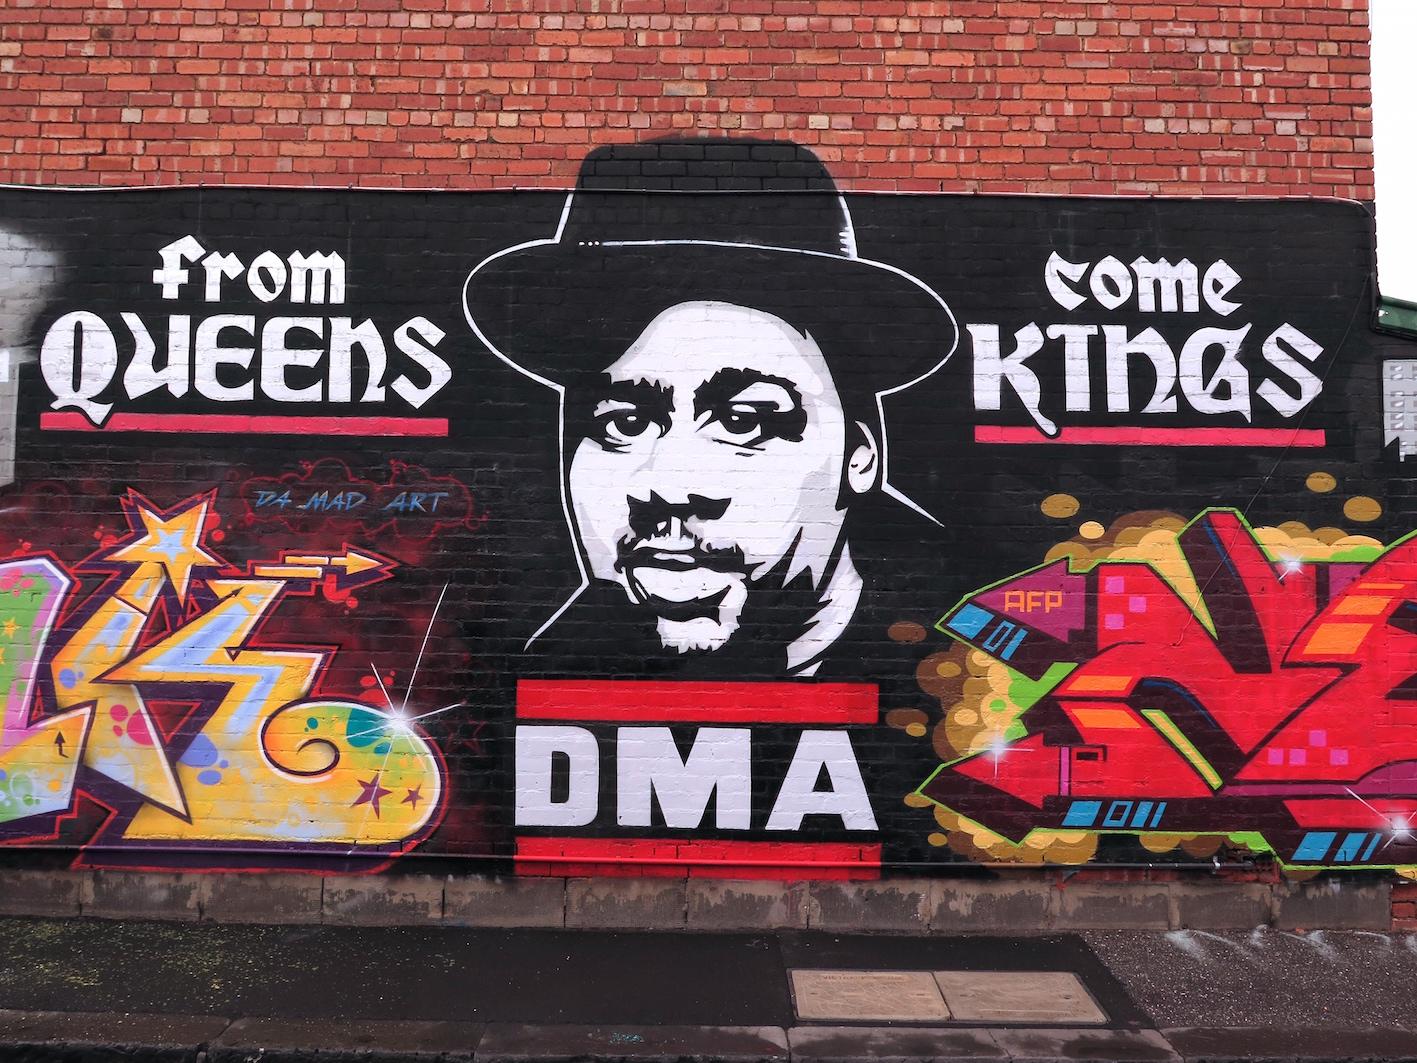 deansunshine_landofsunshine_melbourne_streetart_graffiti_ DMA wall fitzroy 3